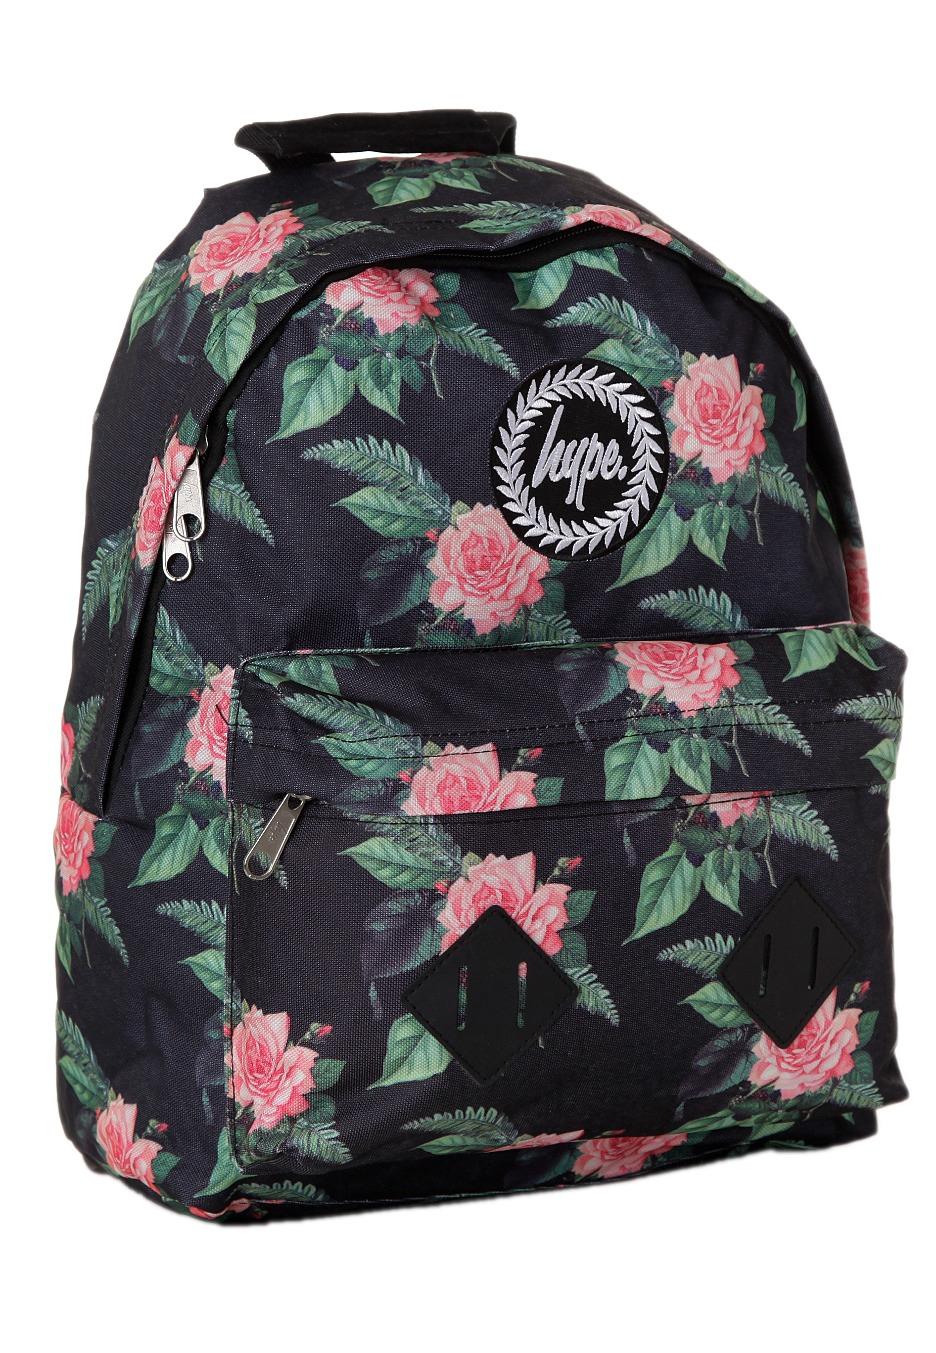 Hype Black Pink Feb Flowers Backpack - Flowers Healthy 92d27f6000899